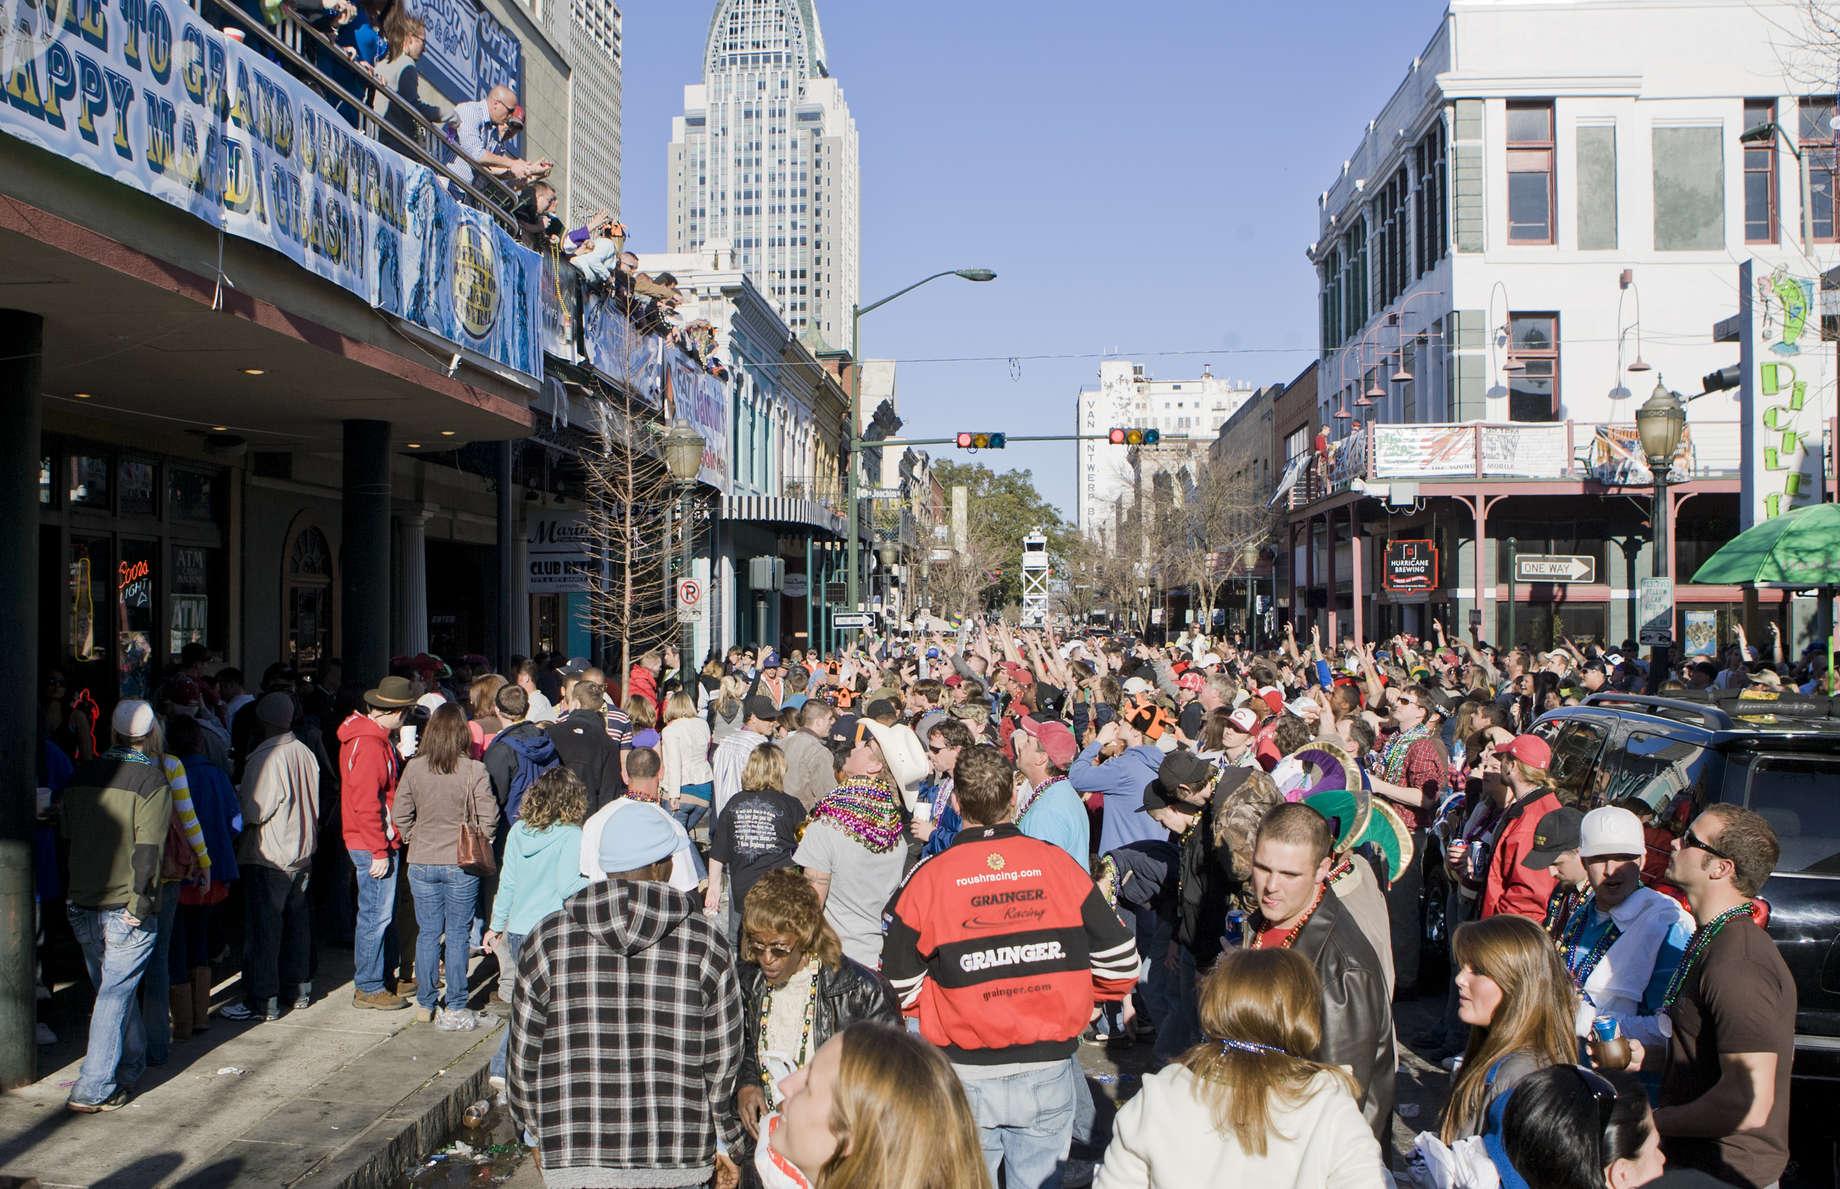 Underrated US Cities: Small Markets Like Cincinnati, Mobile